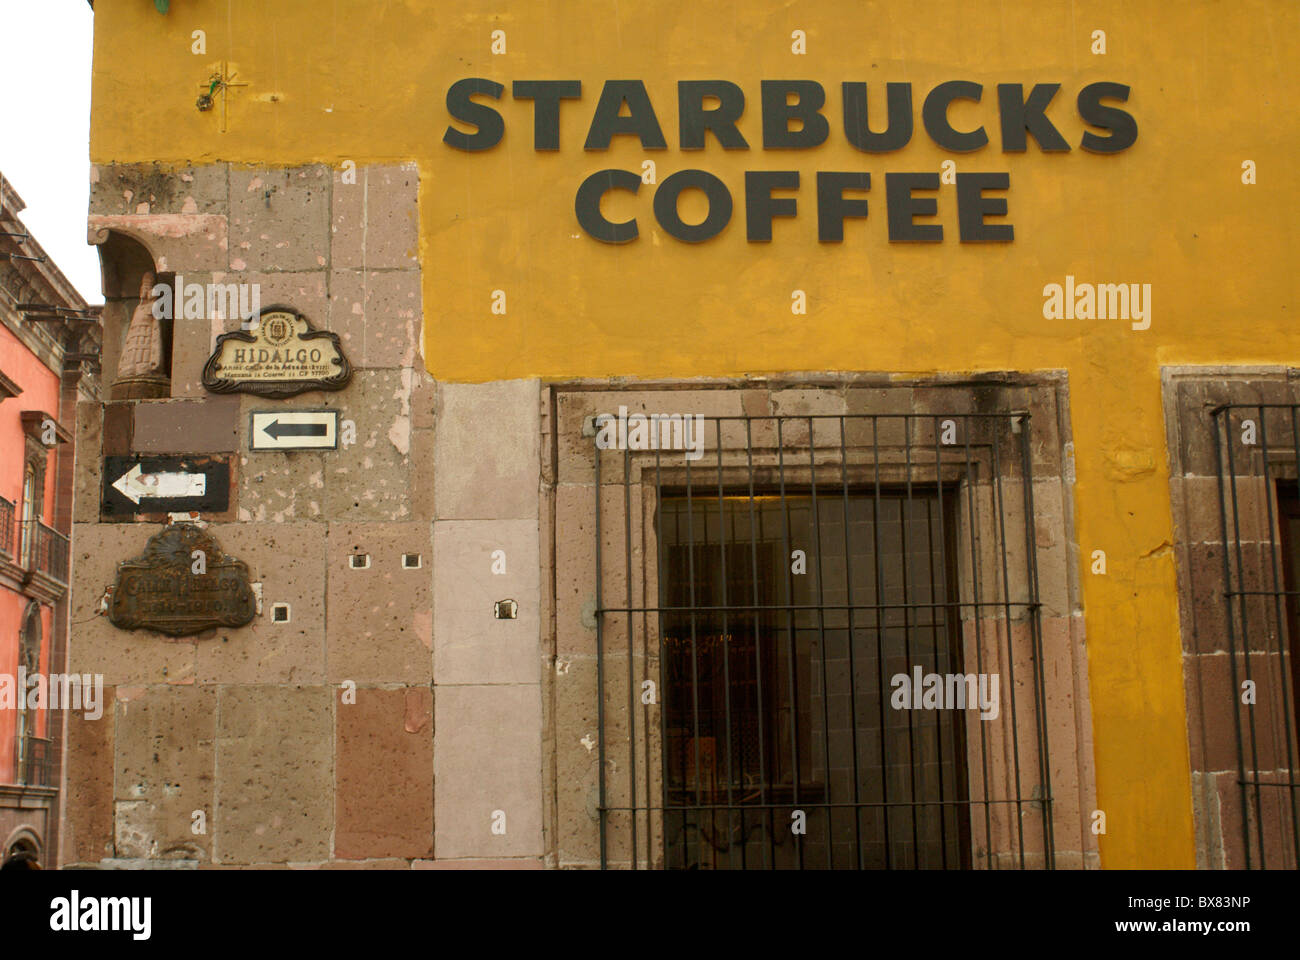 Starbucks Coffee shop in San Miguel de Allende, Mexico. San Miguel de Allende is a UNESCO World Heritage Site. - Stock Image